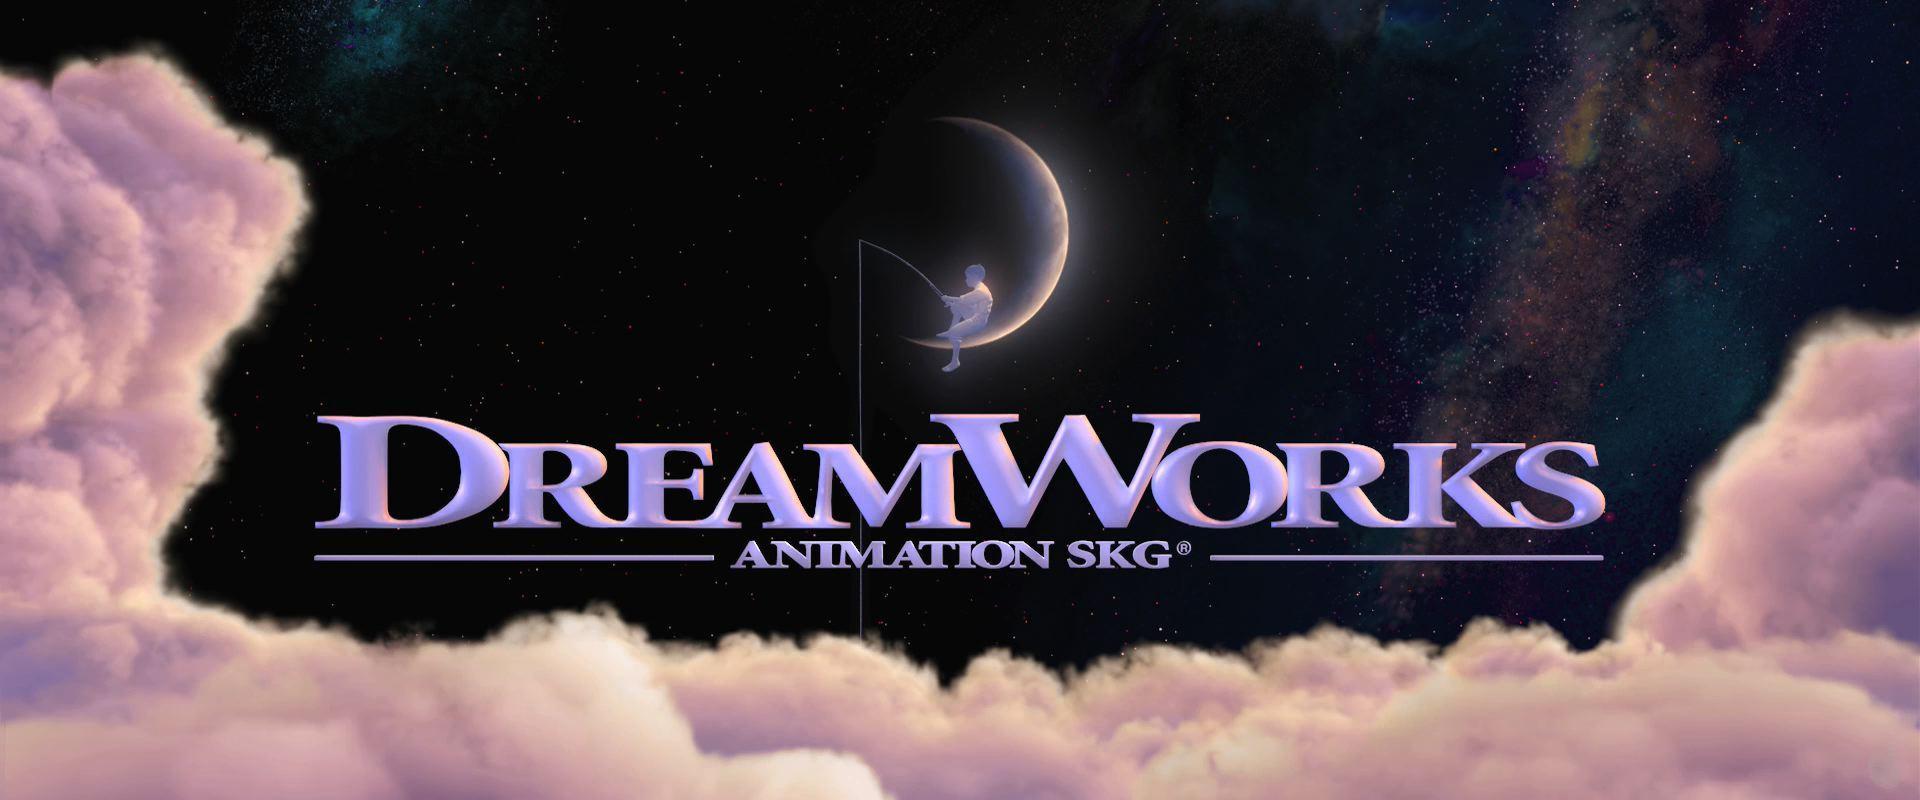 Dessins animés Dreamworks